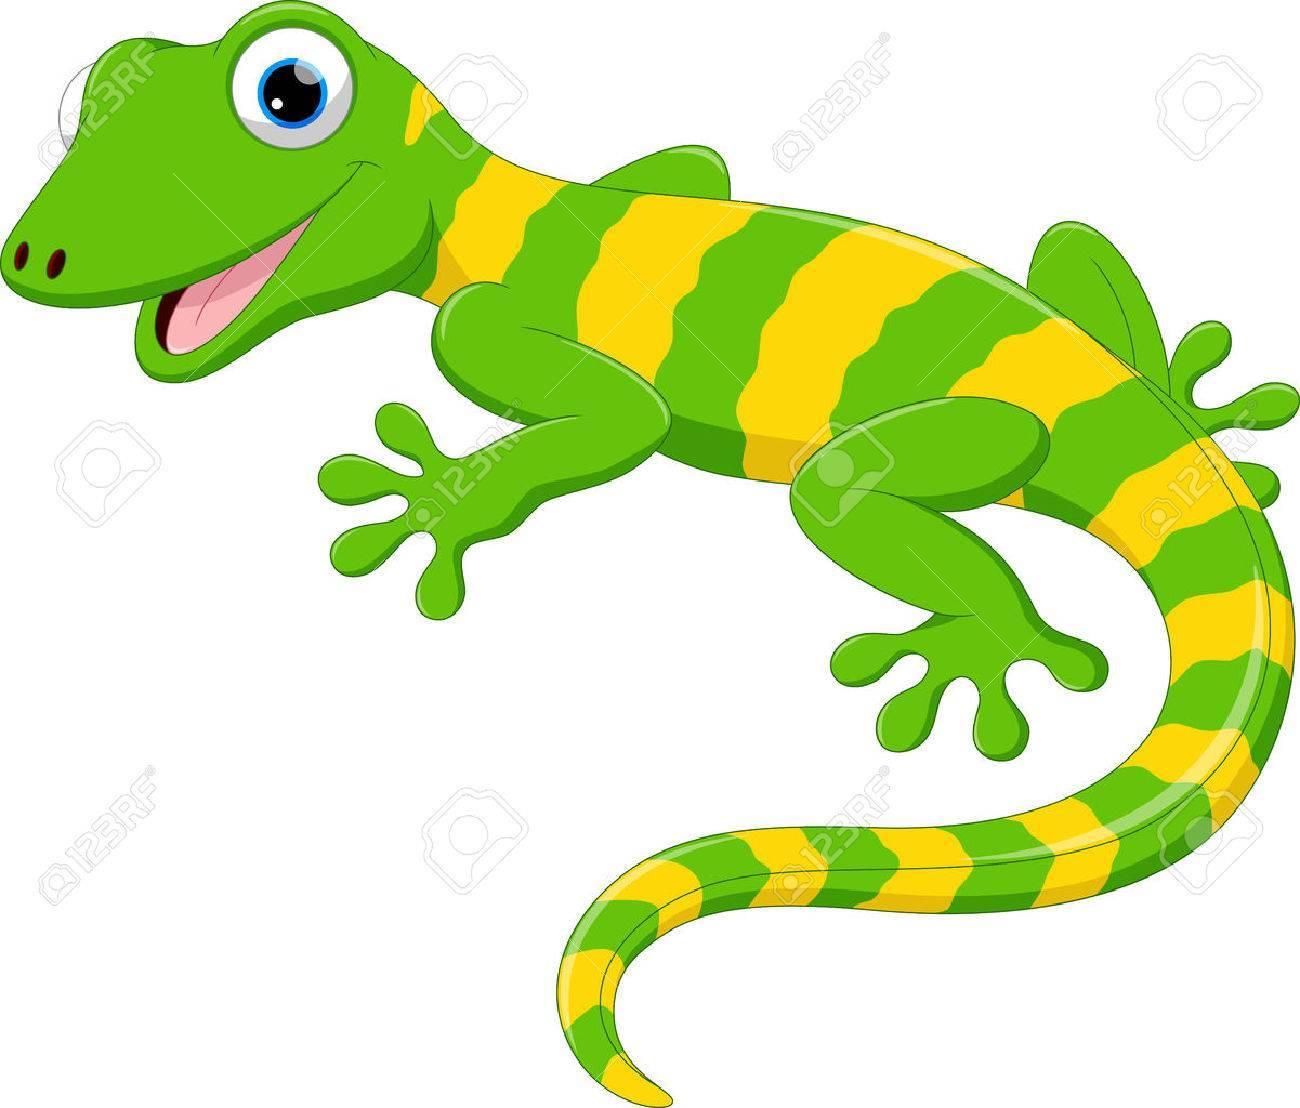 Cute lizard clipart 6 » Clipart Portal.